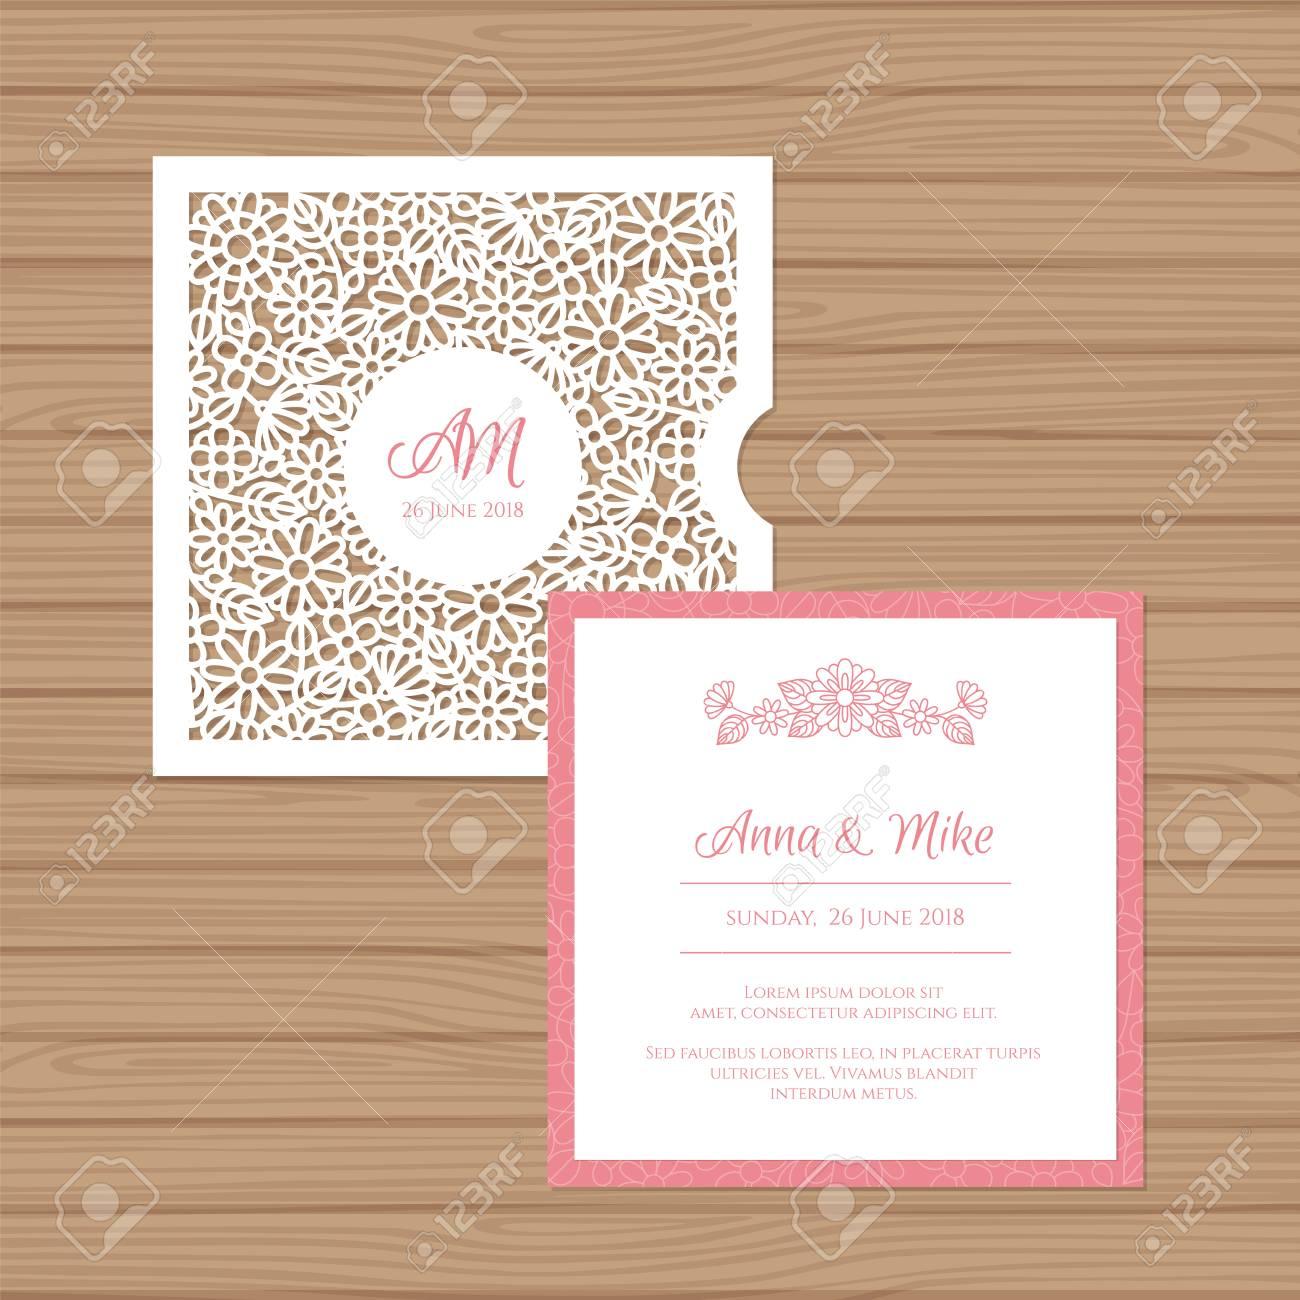 Wedding Invitation Or Greeting Card With Flower Ornament. Cut ...